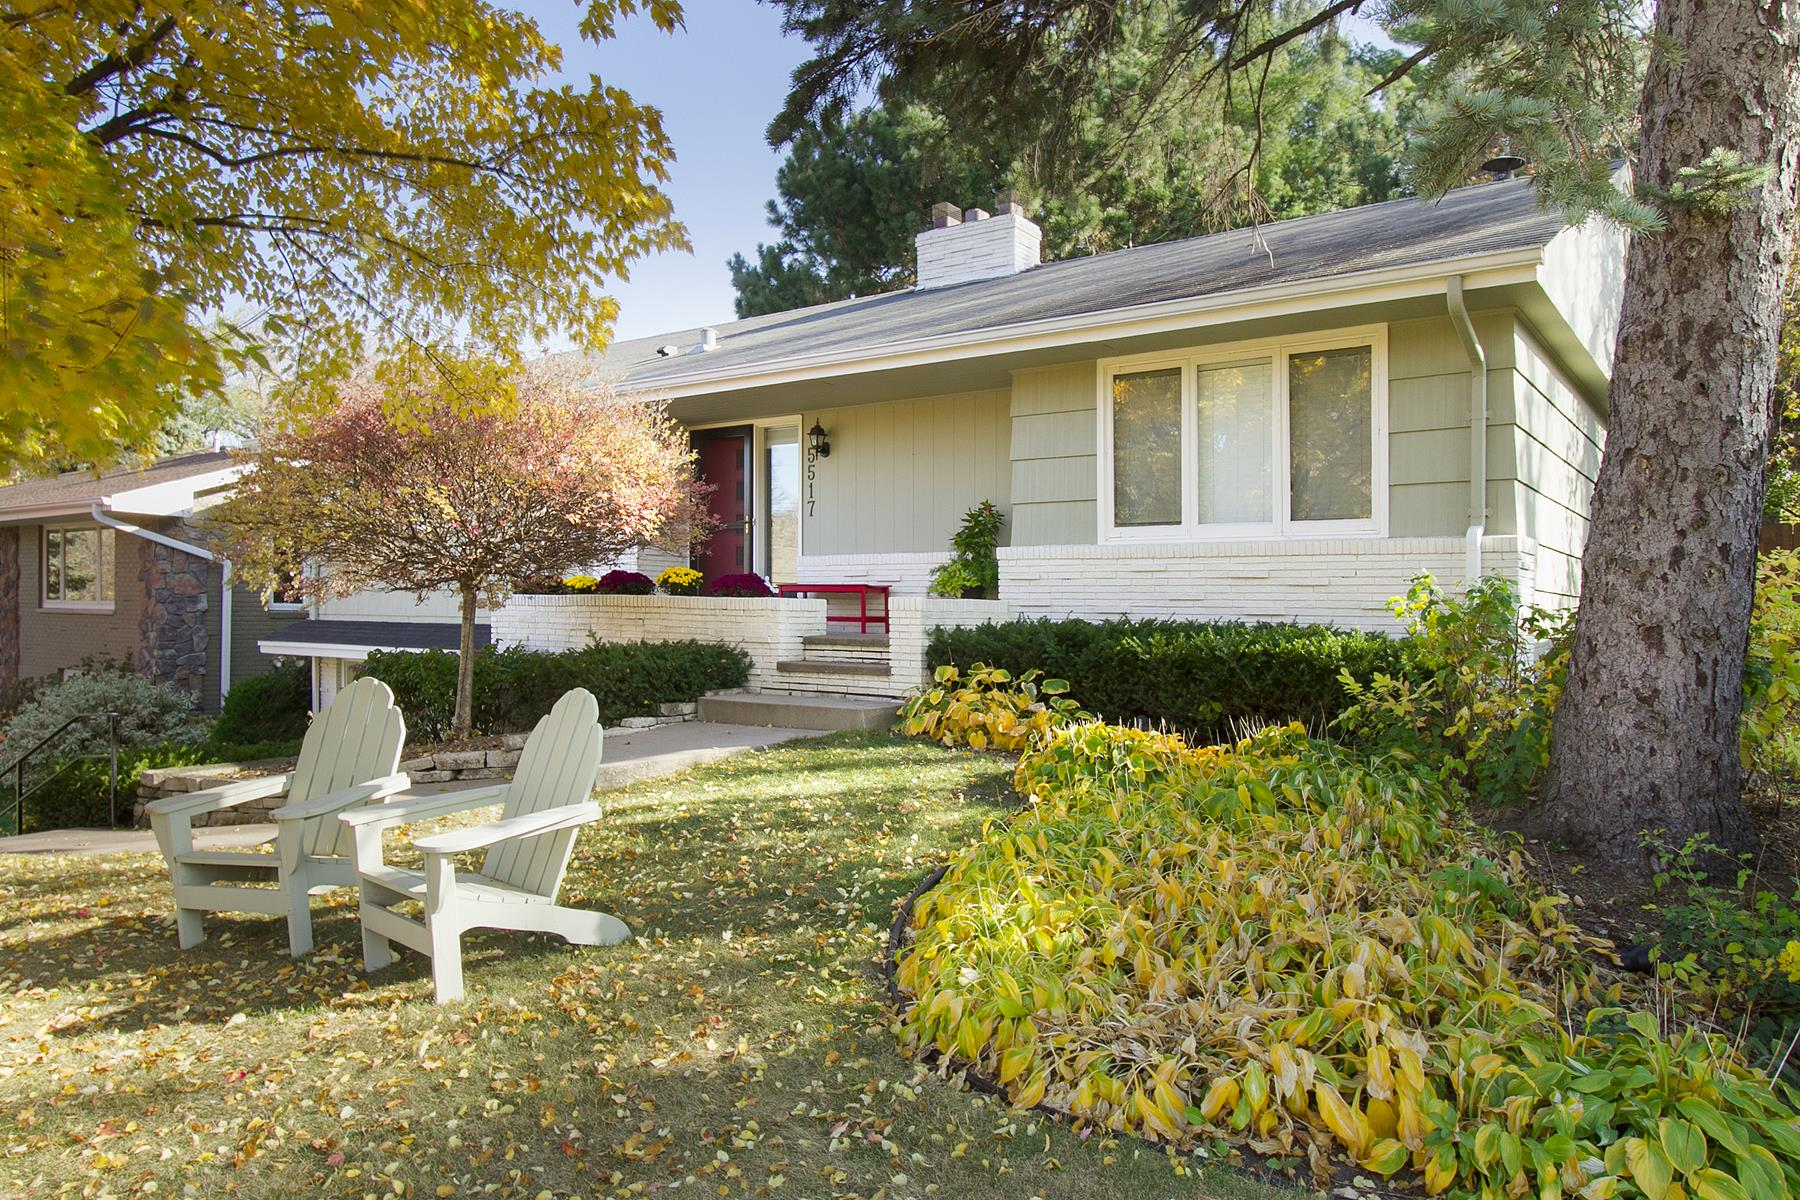 Single Family Home for Sale at 5517 Halifax Lane Edina, Minnesota 55424 United States